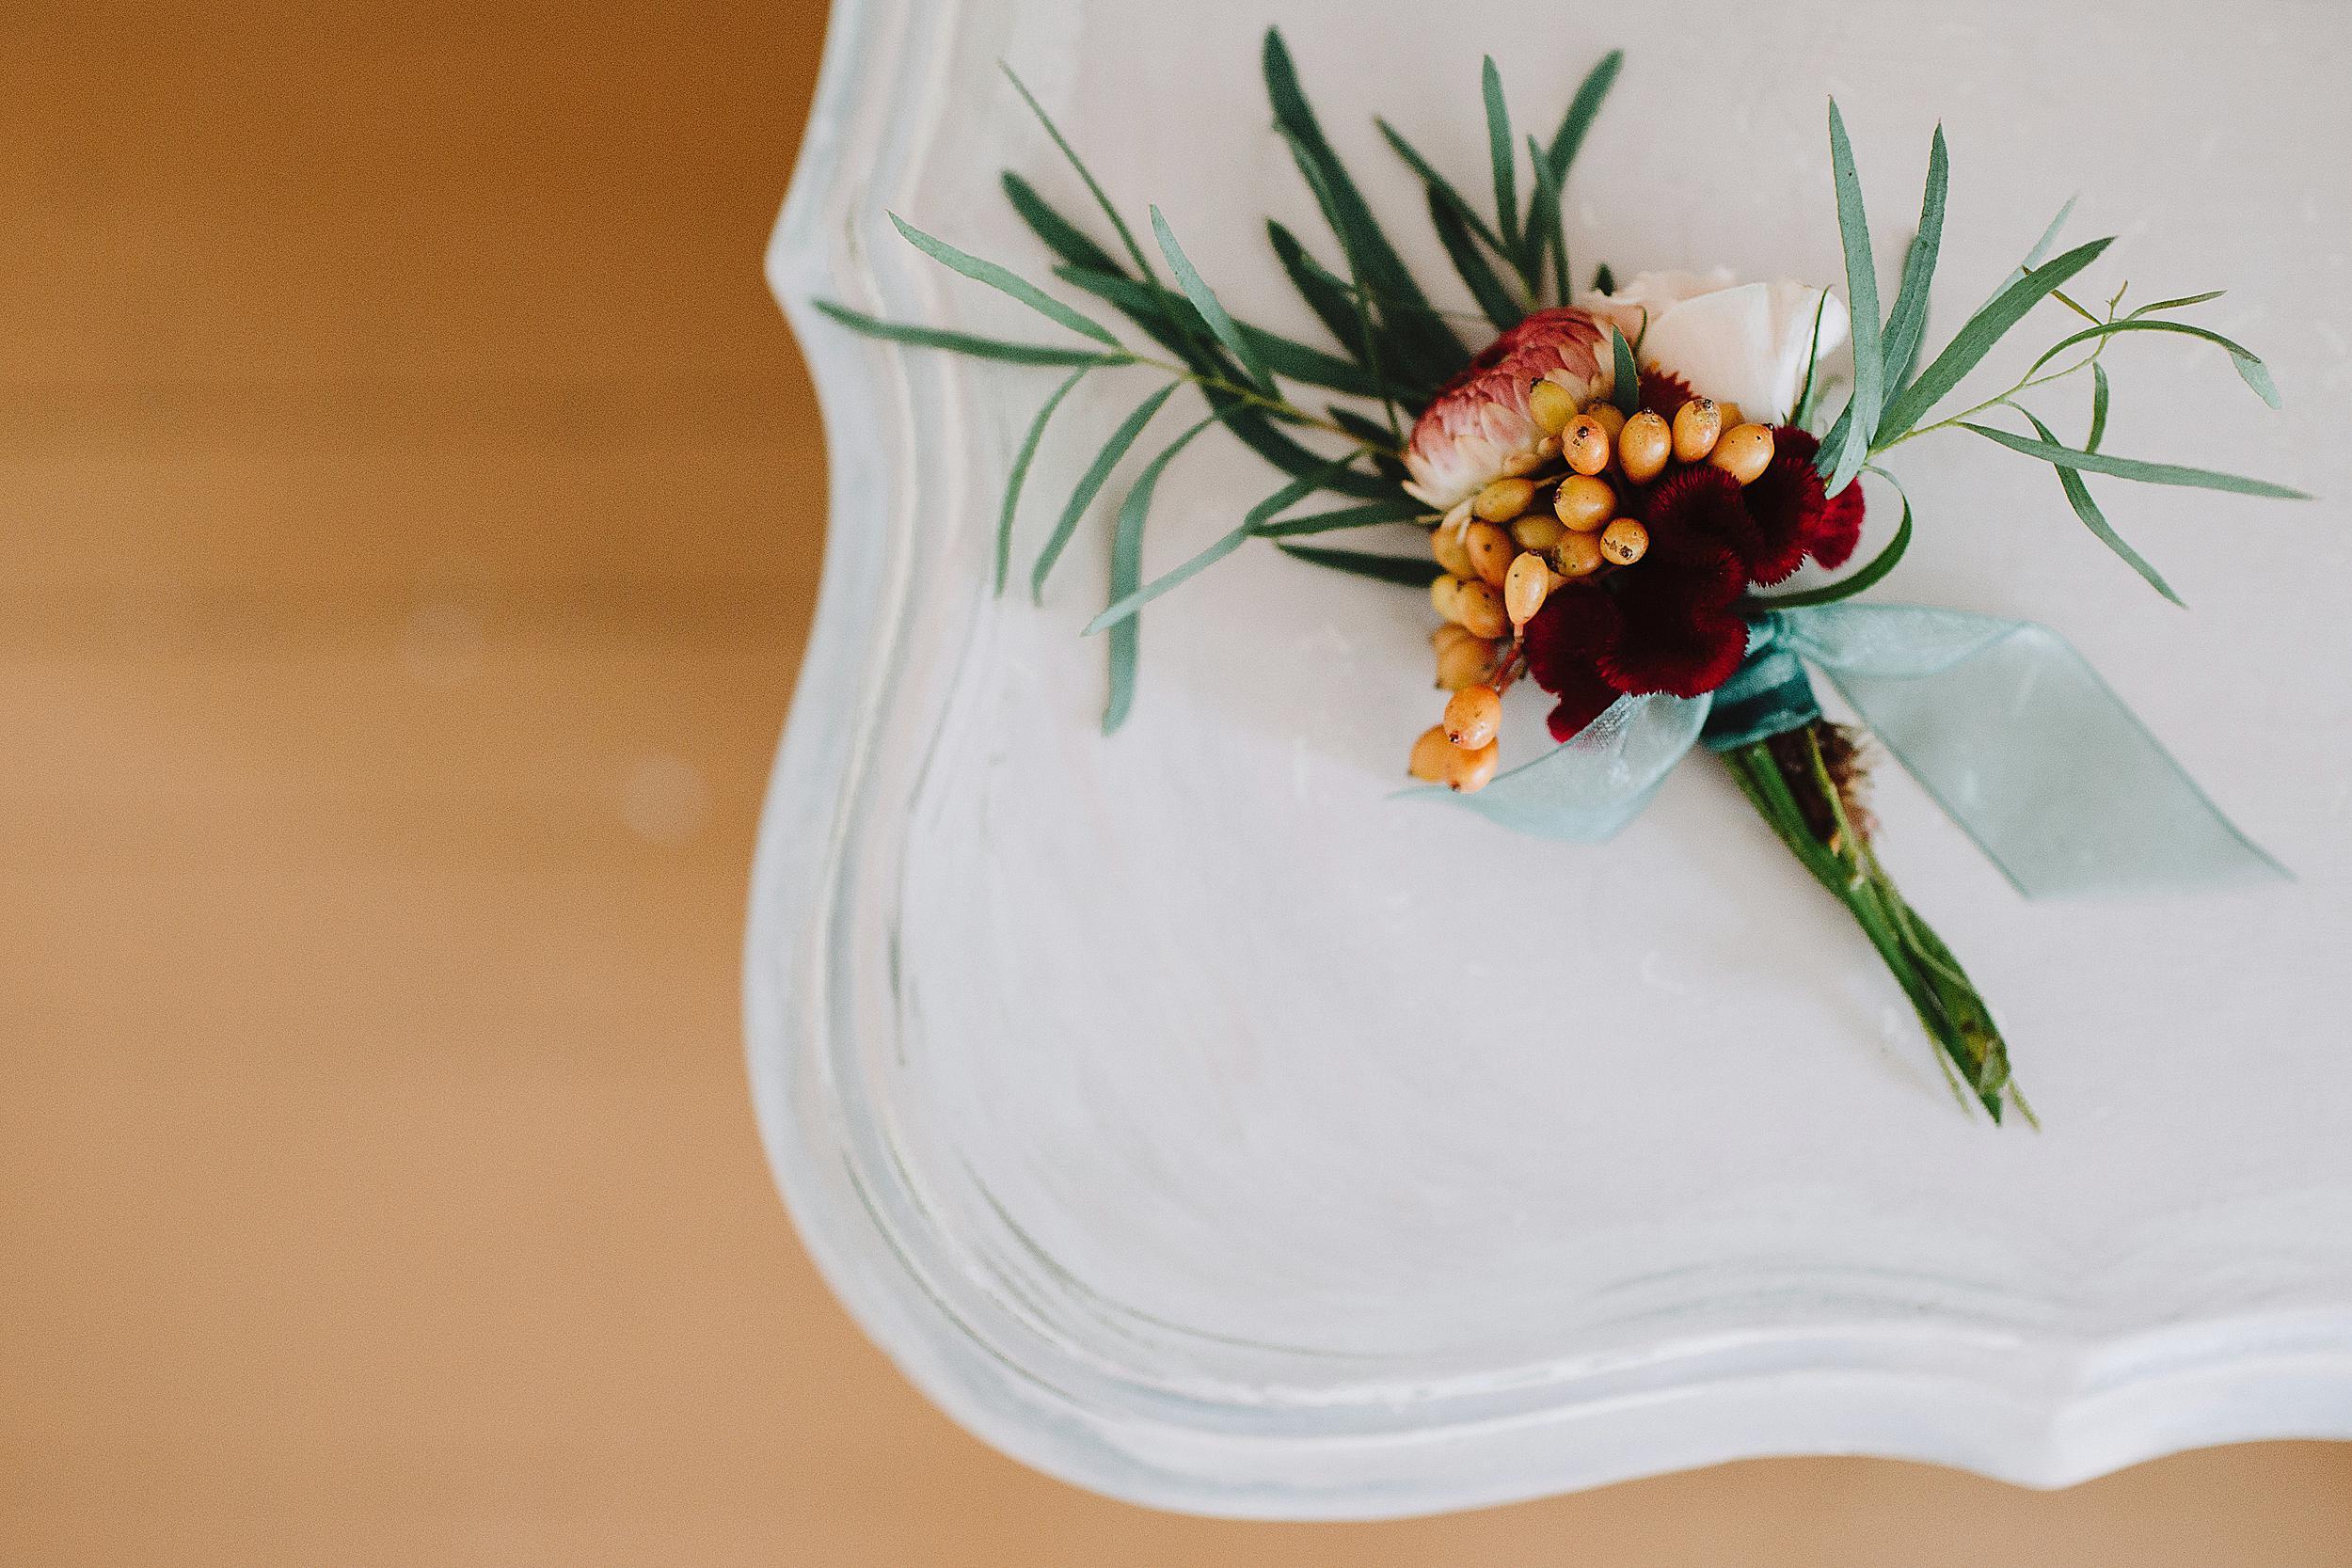 historic_shady_lane_wedding_with_love_and_embers-002.JPG